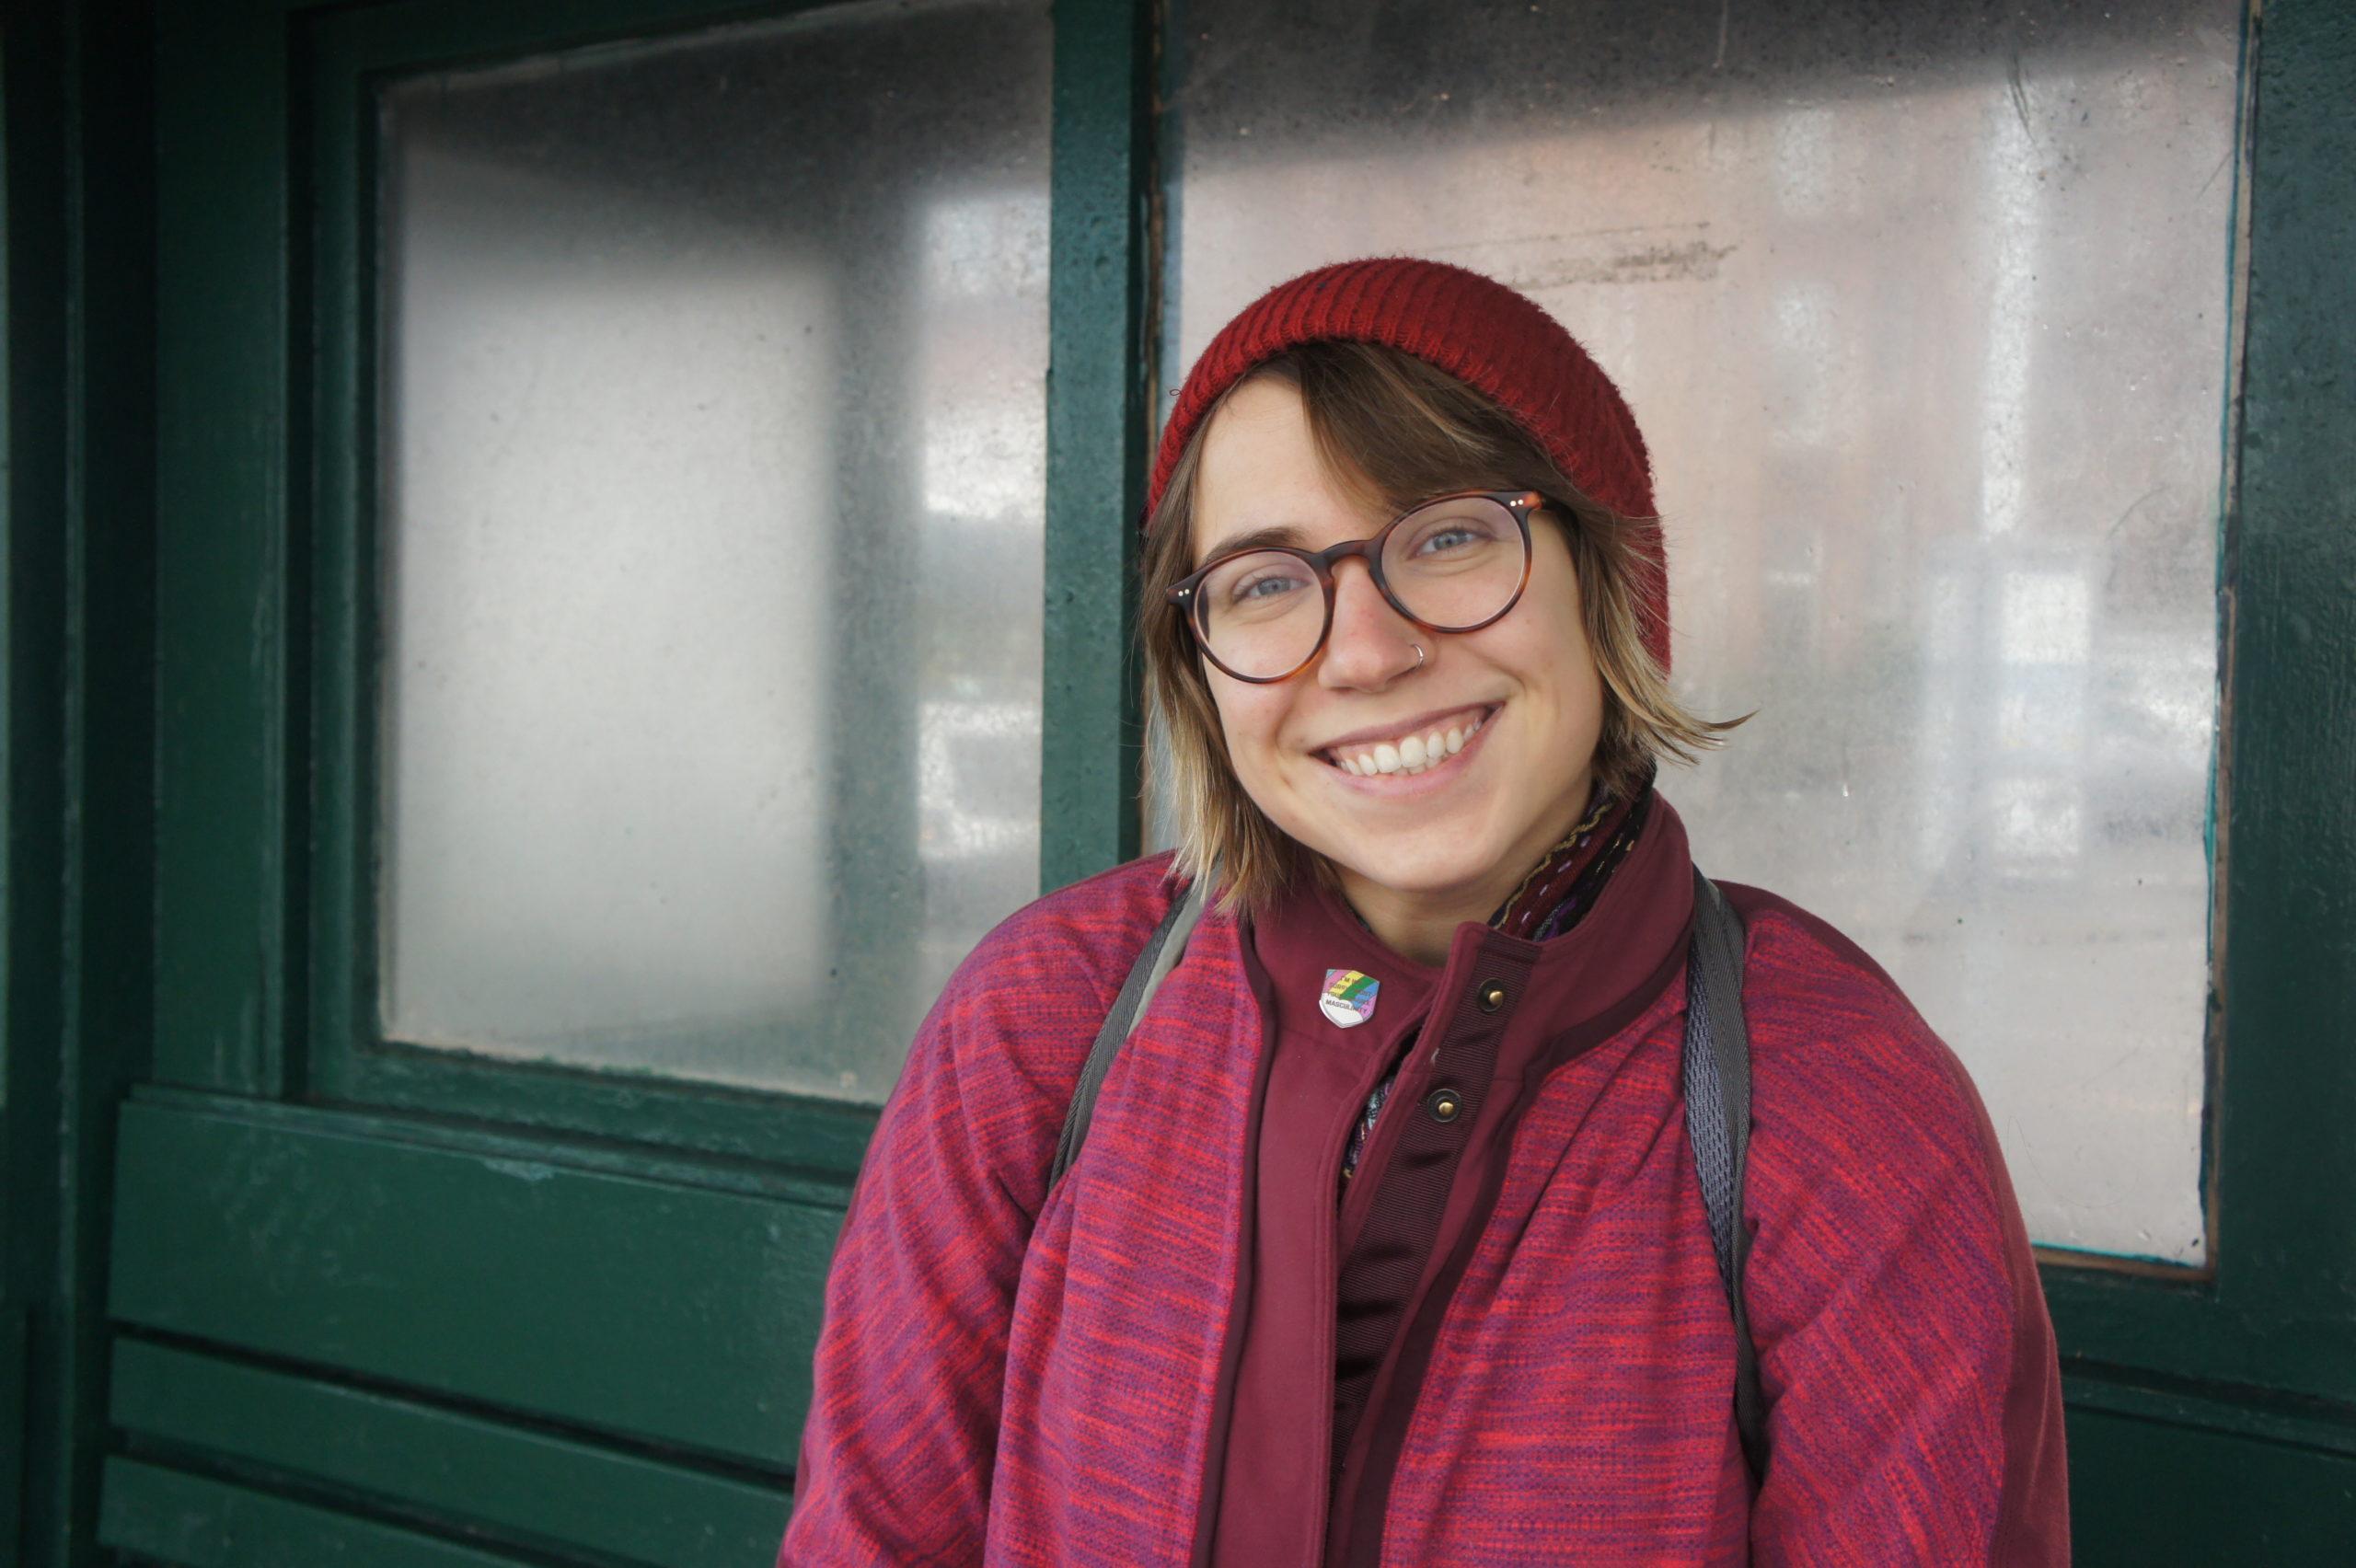 Maria Stoian